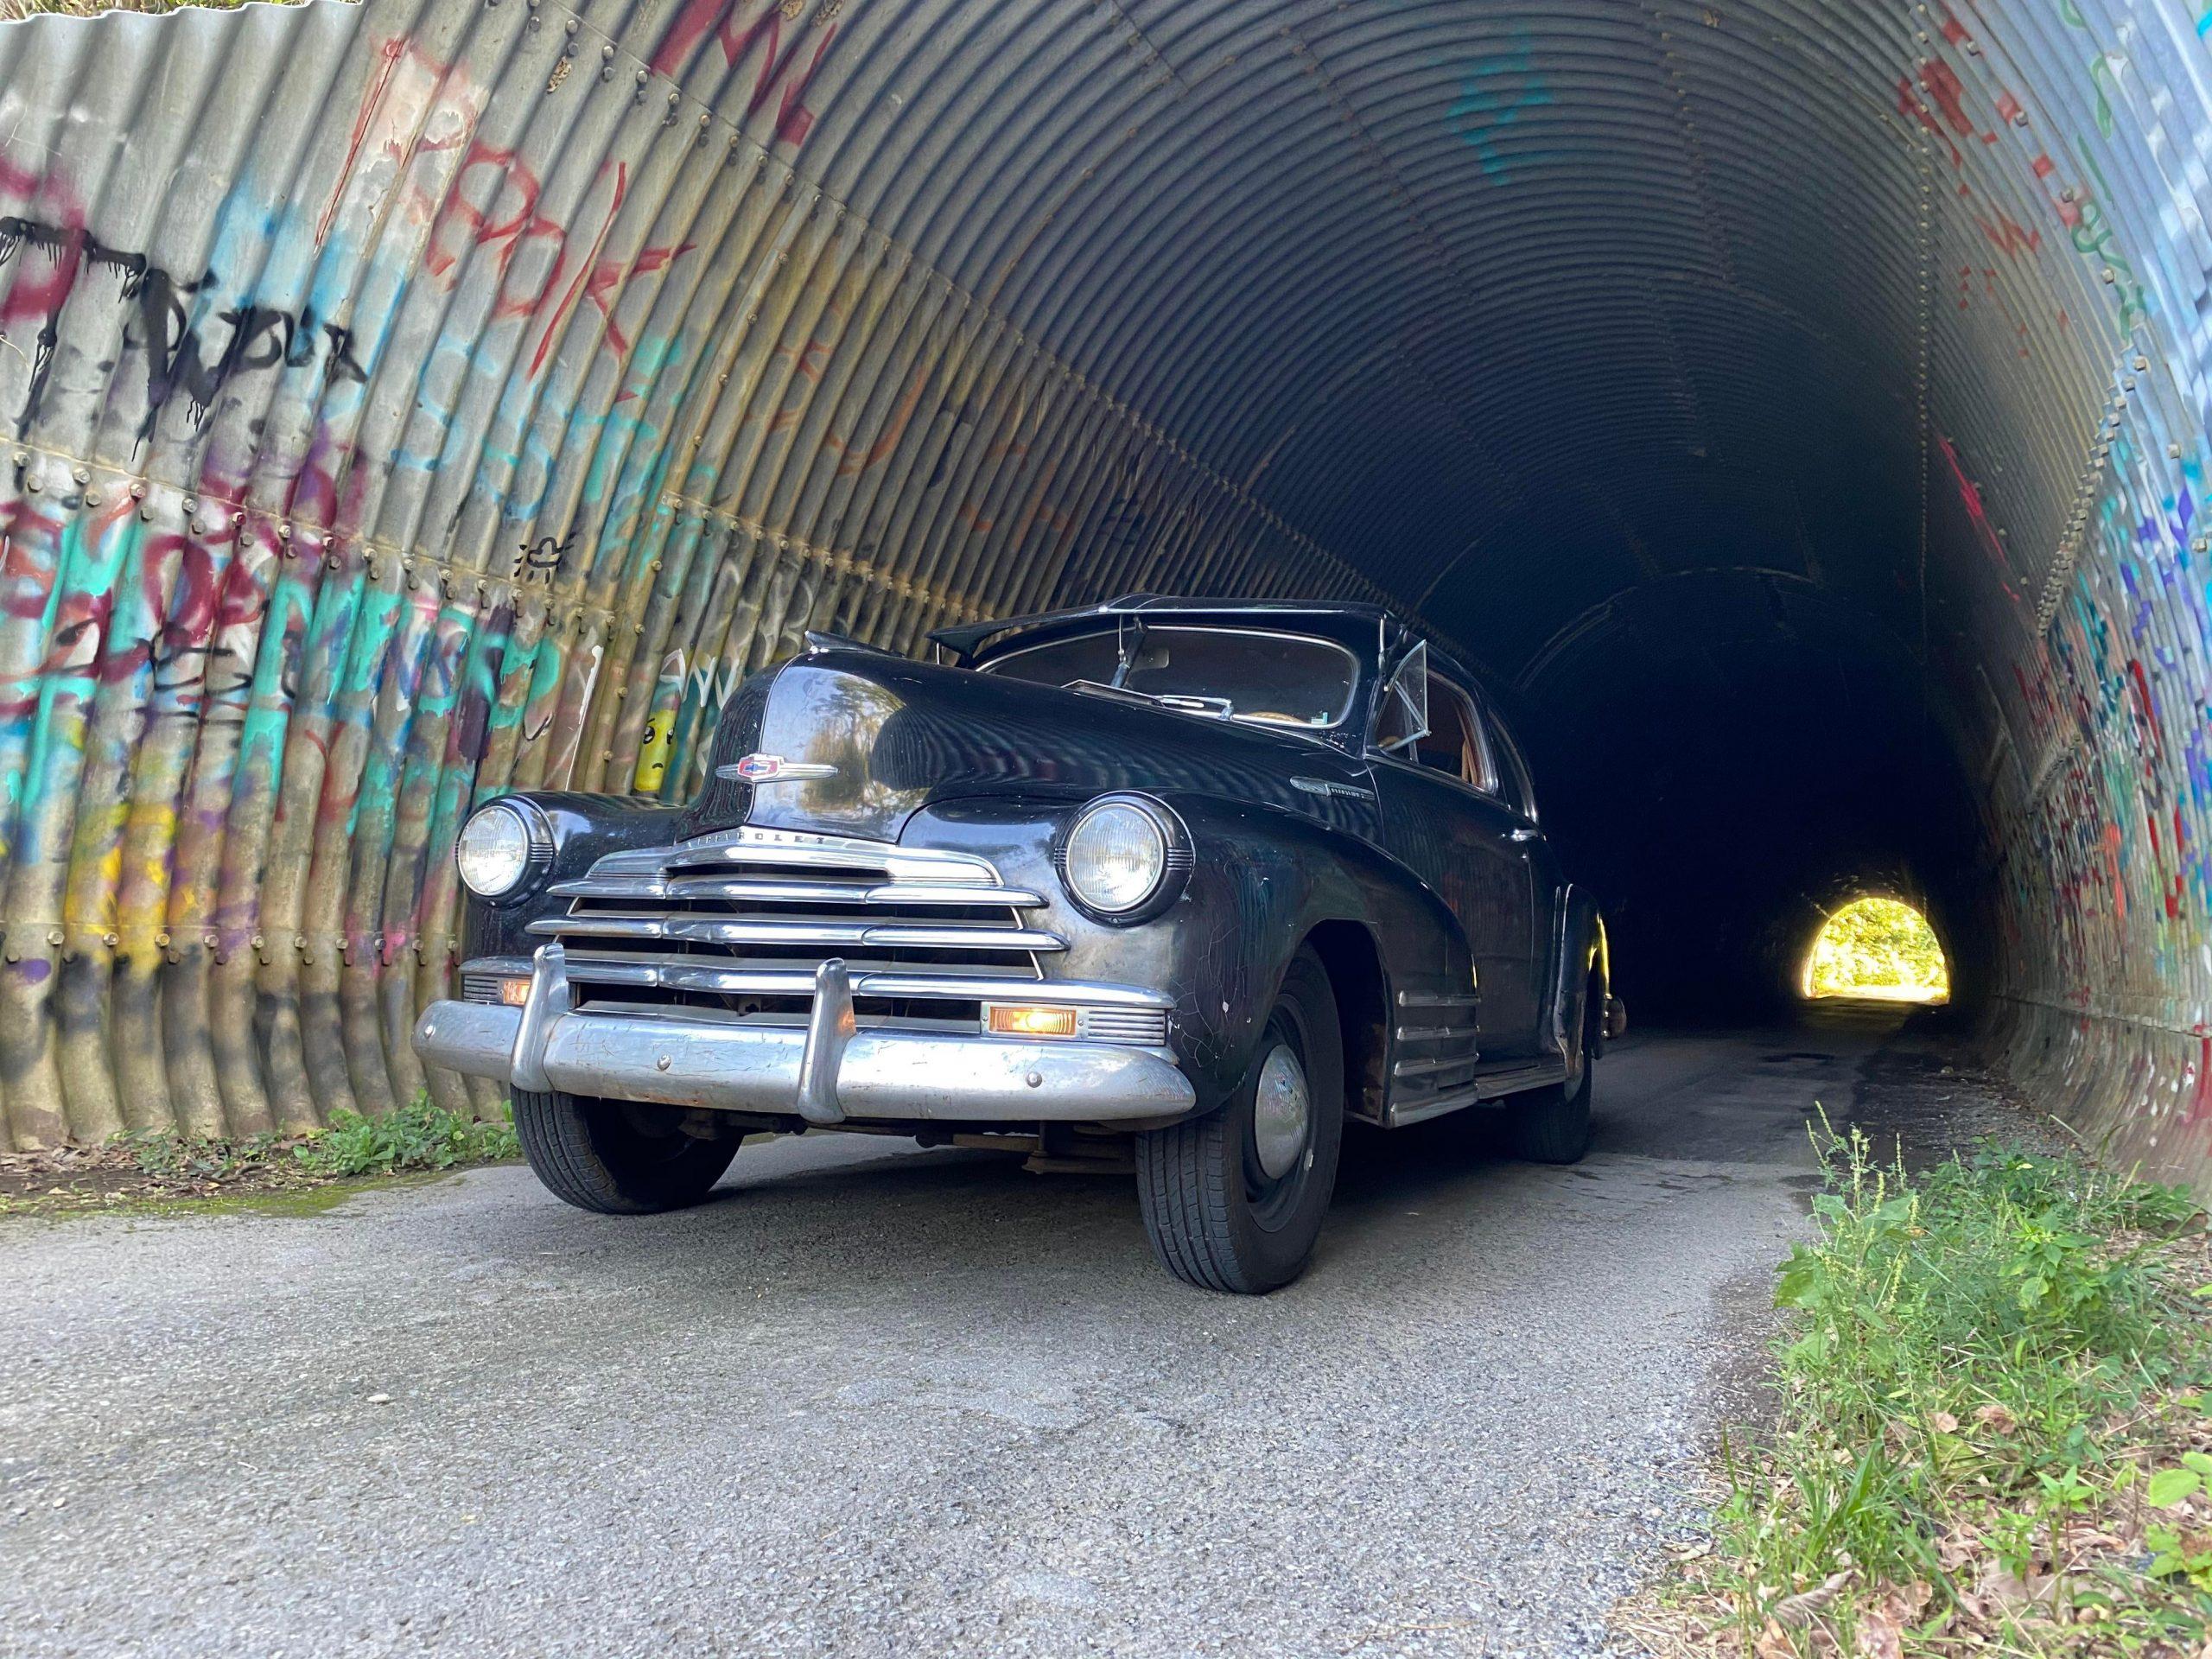 1947 Chevy Fleetline, it was my grandfathers. Now it's mine.